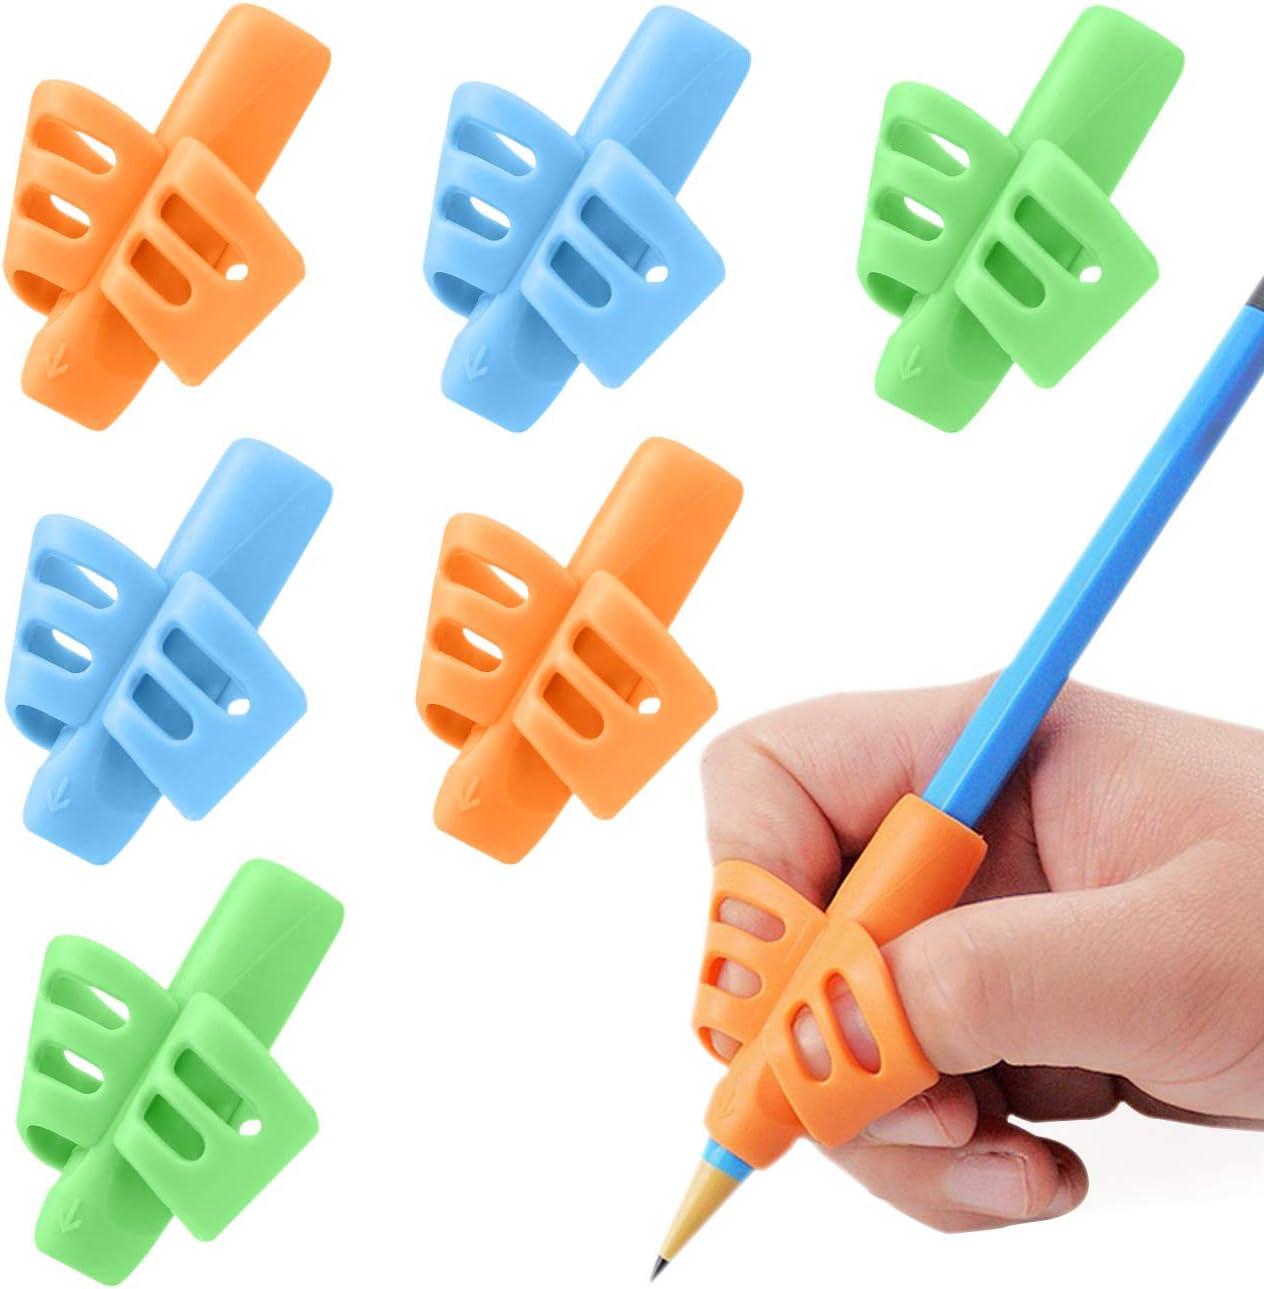 Pencils Overseas parallel import regular item Grips - Popular product JuneLsy Postu for Handwriting Kids